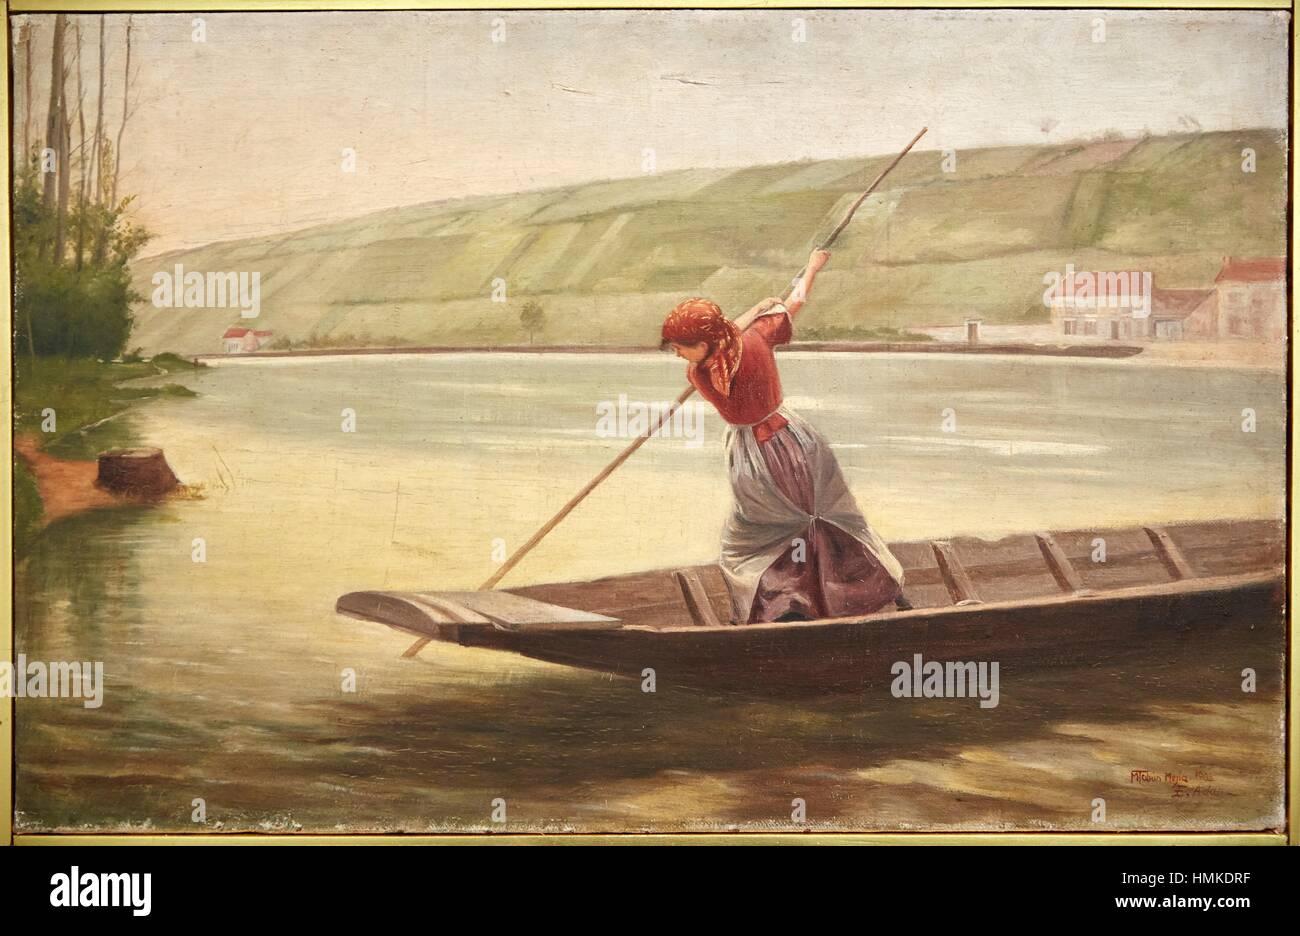 'Journey', 1902, Marco Tobón Mejía, Museo de Antioquia, Medellin, Antioquia, Colombia - Stock Image